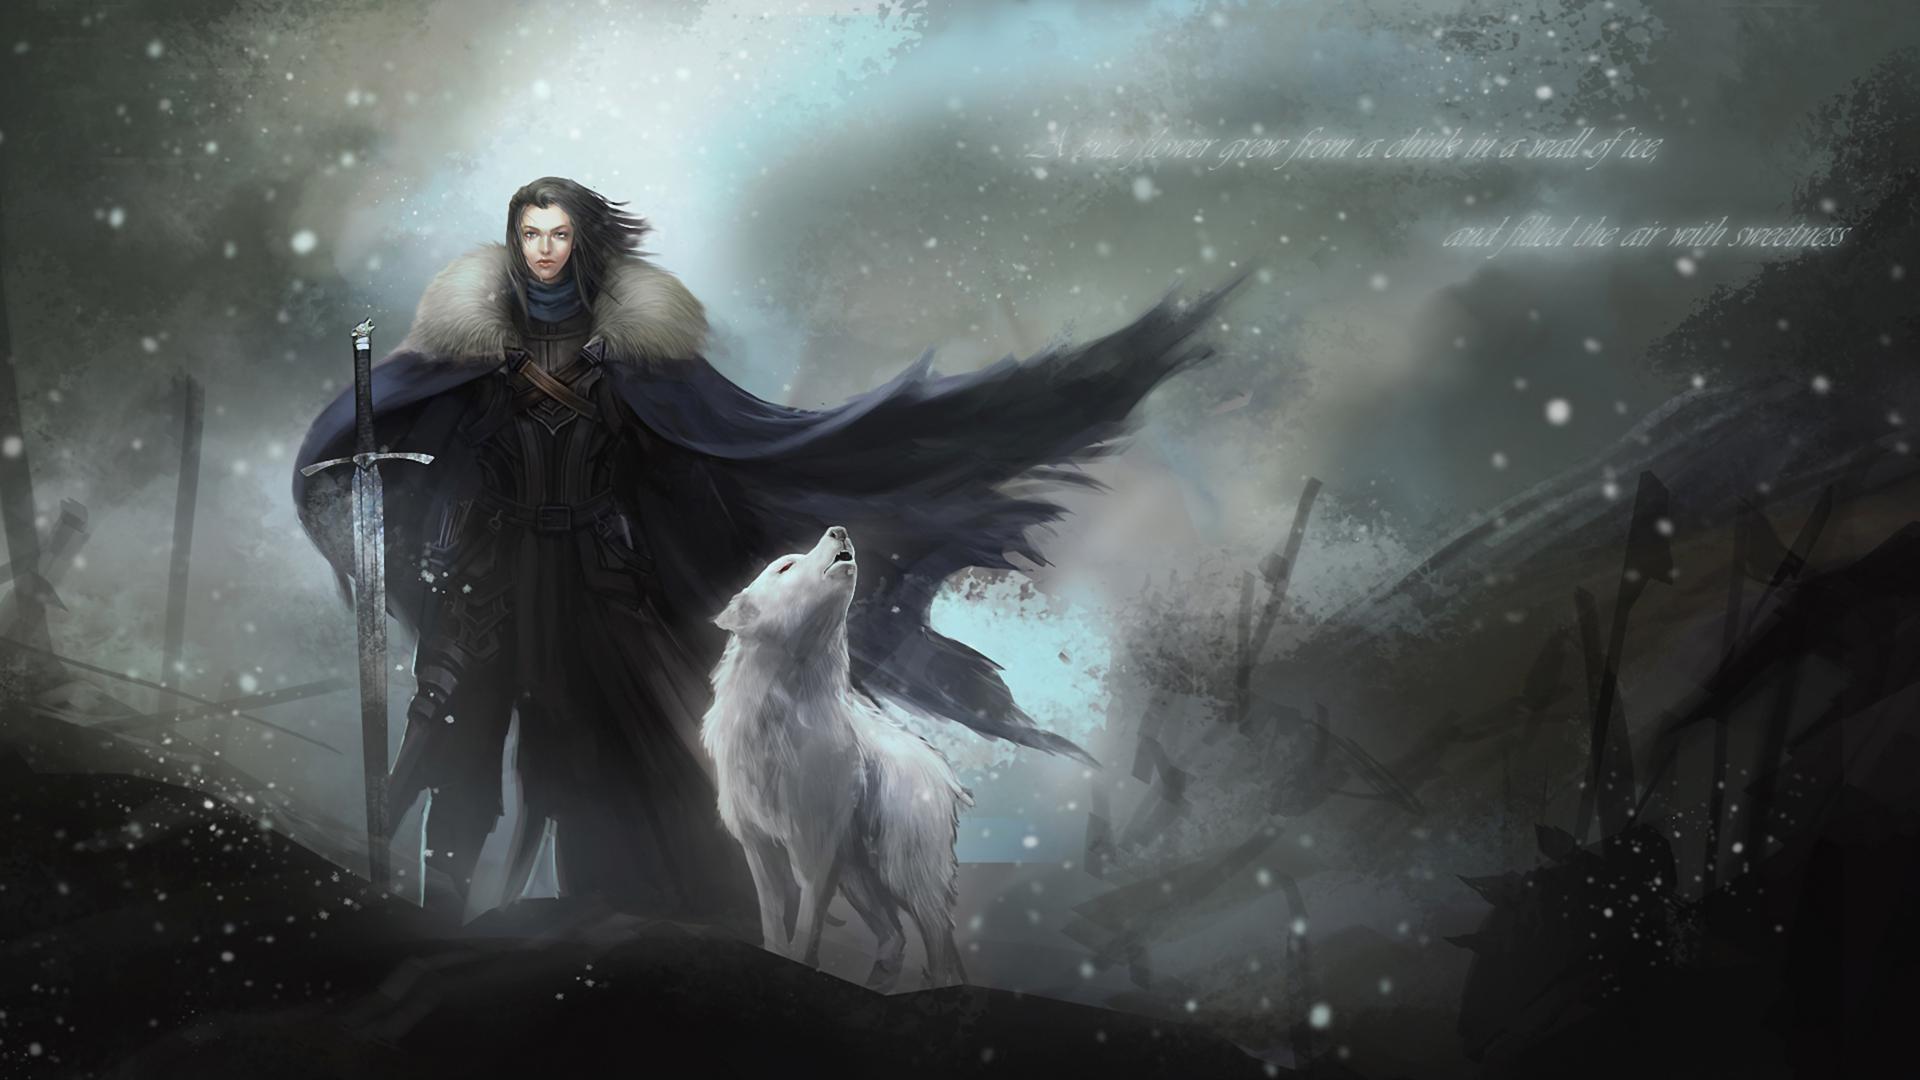 https://staticdn.lovities.com/img/post/719612004/jon-snow-y-fantasma-15507.jpeg    Winter is coming   Pinterest